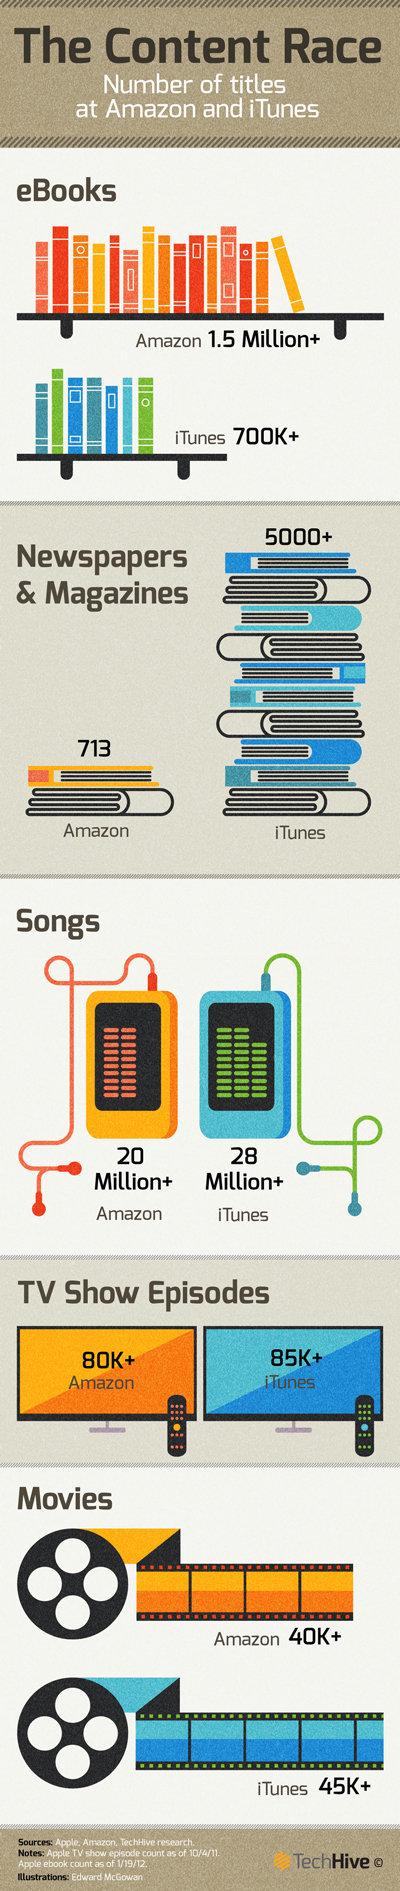 Amazon vs iTunes : la course au contenu